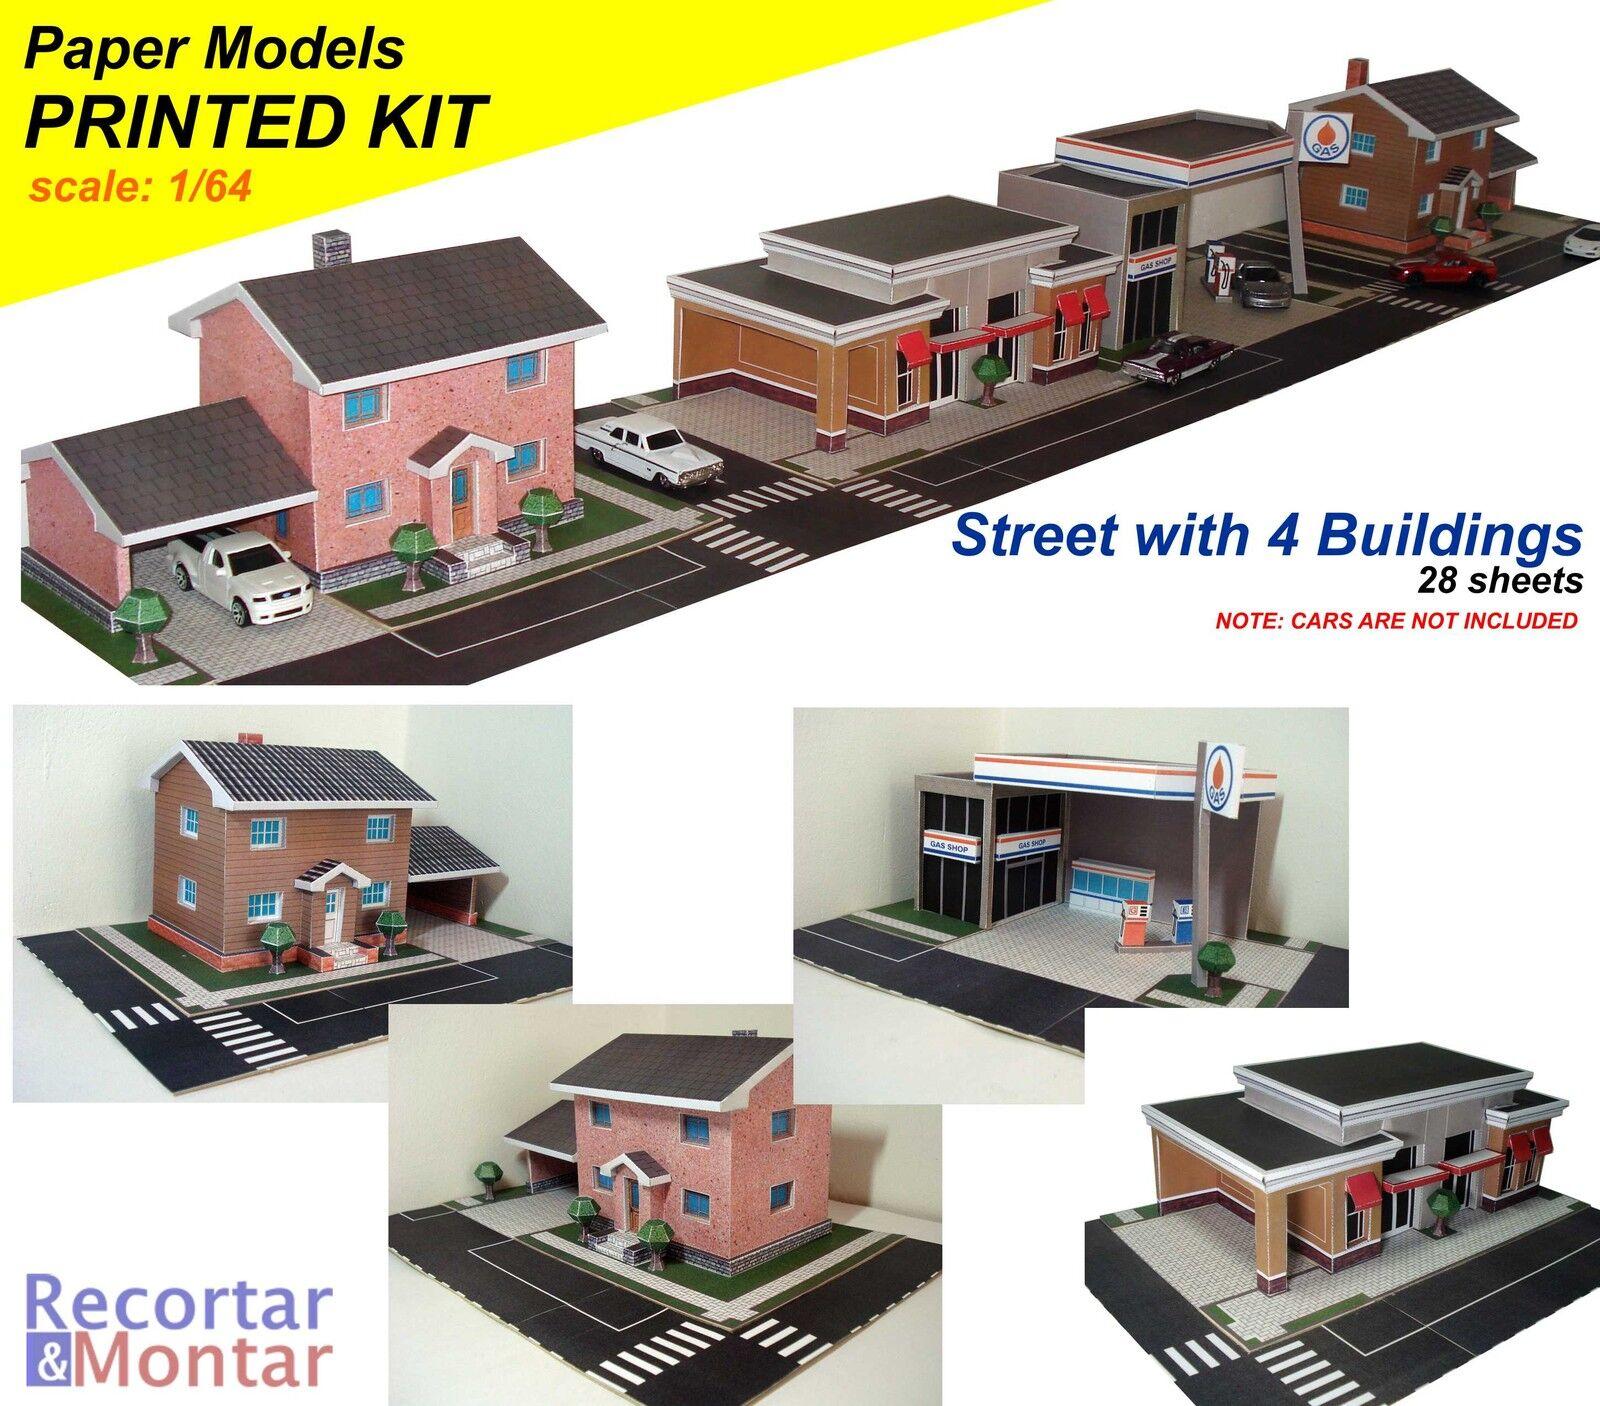 Inkjet printed 1:64 3D Paper Model City Building: House, Gas Station, Shop  Store